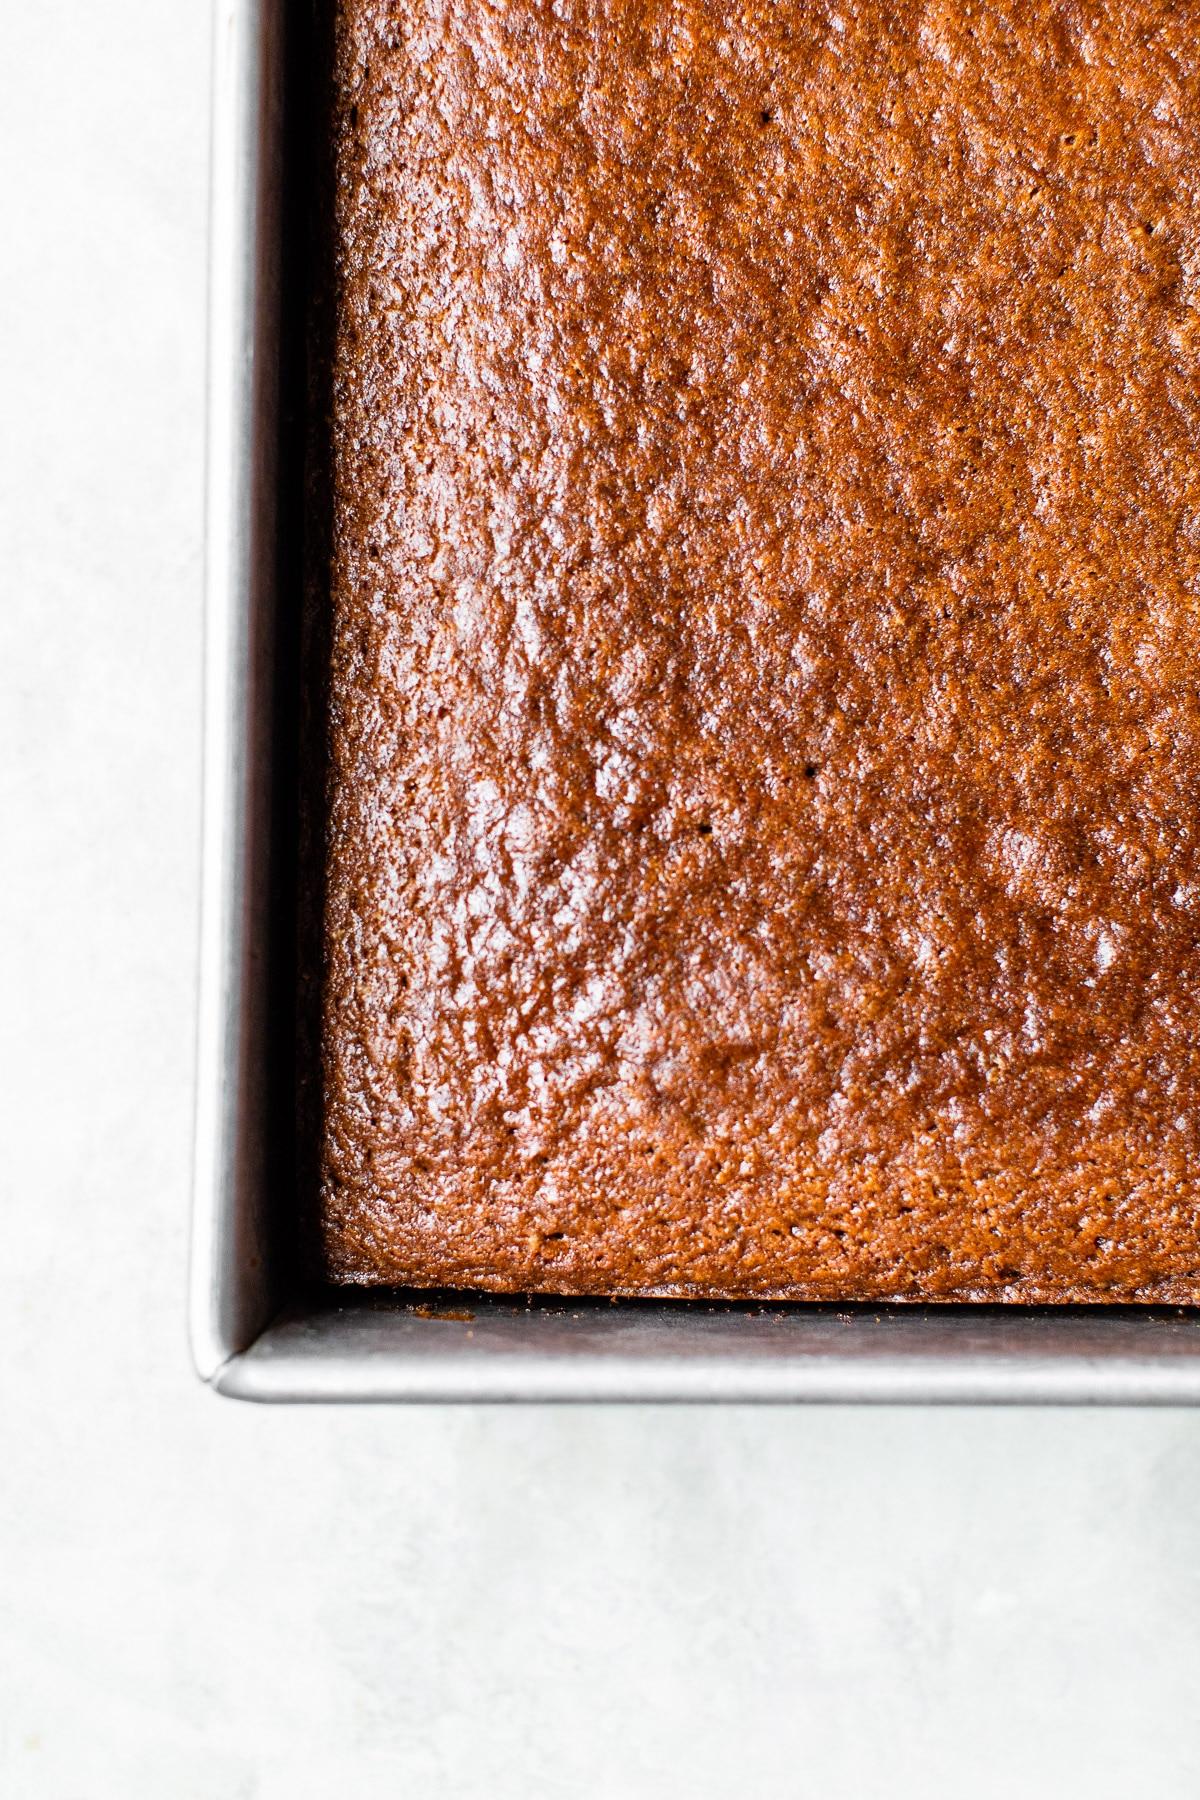 square cake in a cake pan